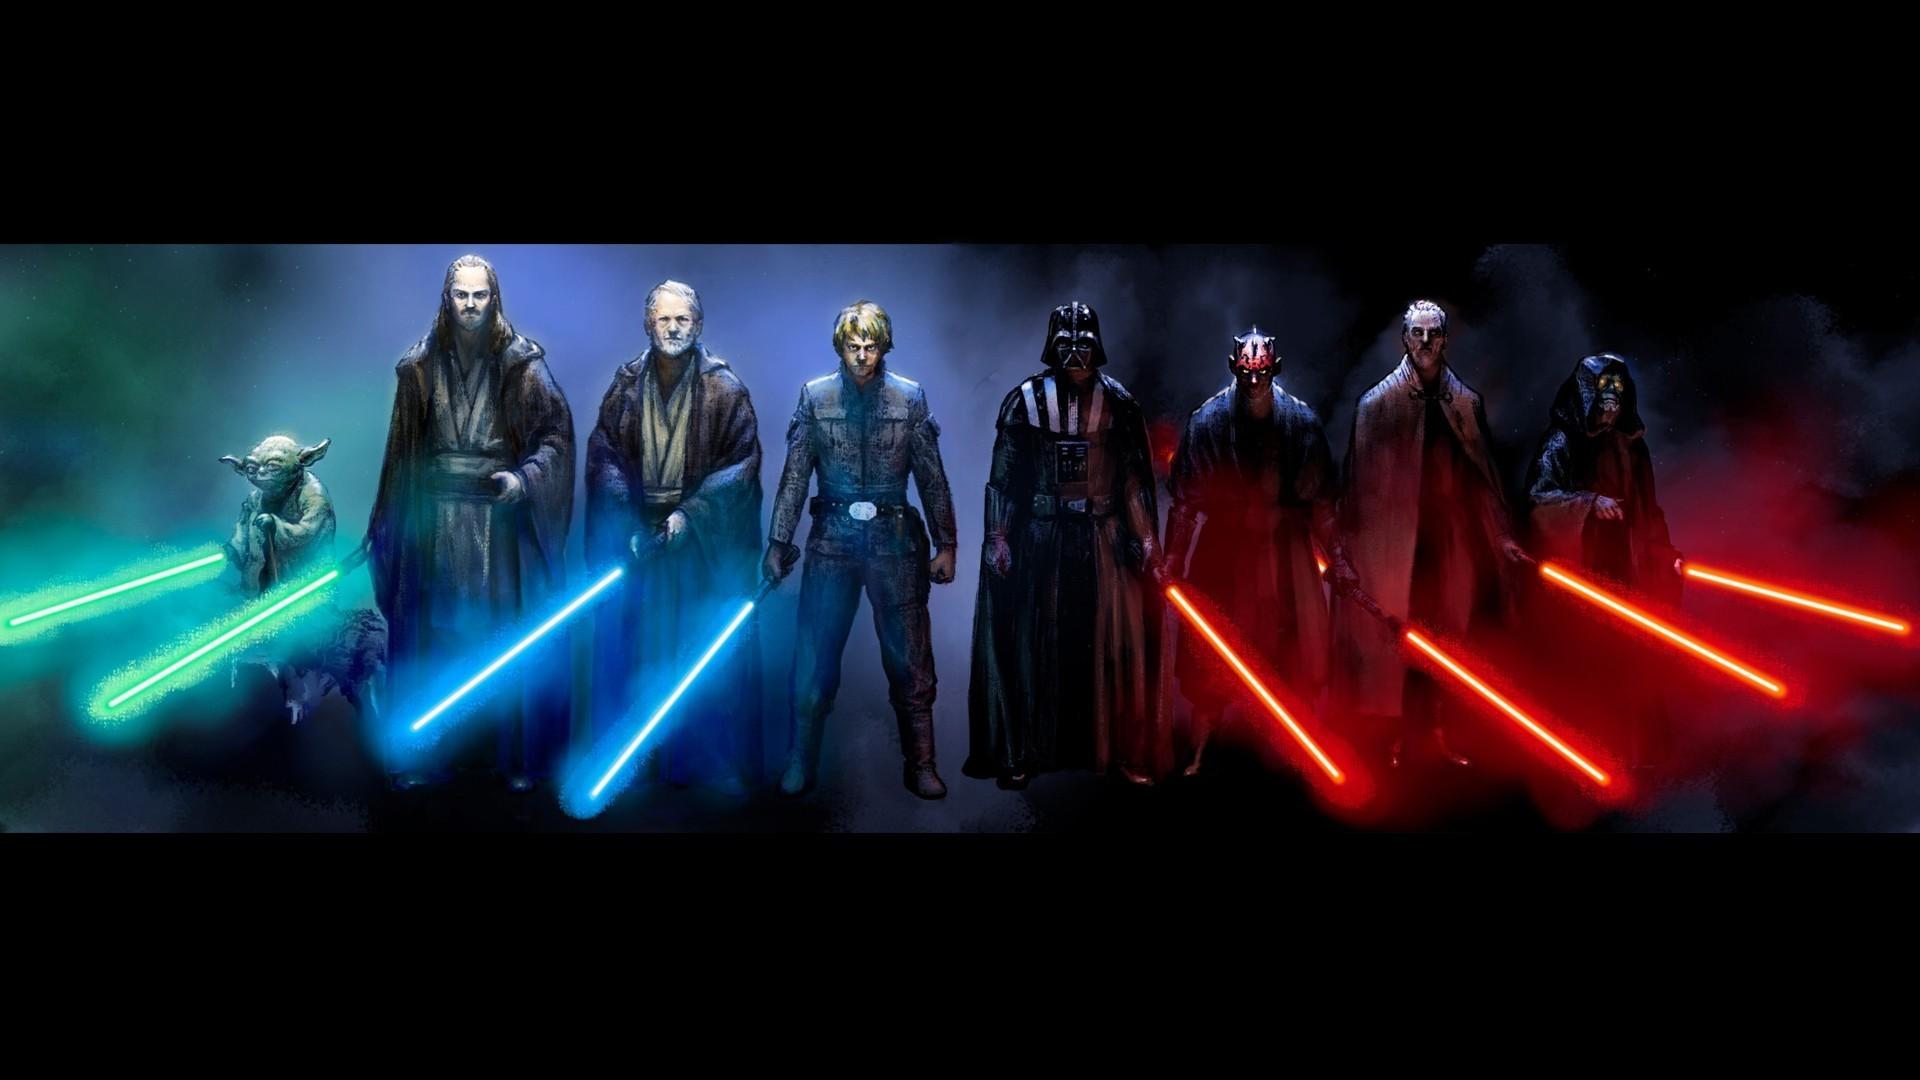 Star Wars, Luke Skywalker, Darth Vader, Darth Maul, Obi Wan Kenobi, Yoda  Wallpapers HD / Desktop and Mobile Backgrounds